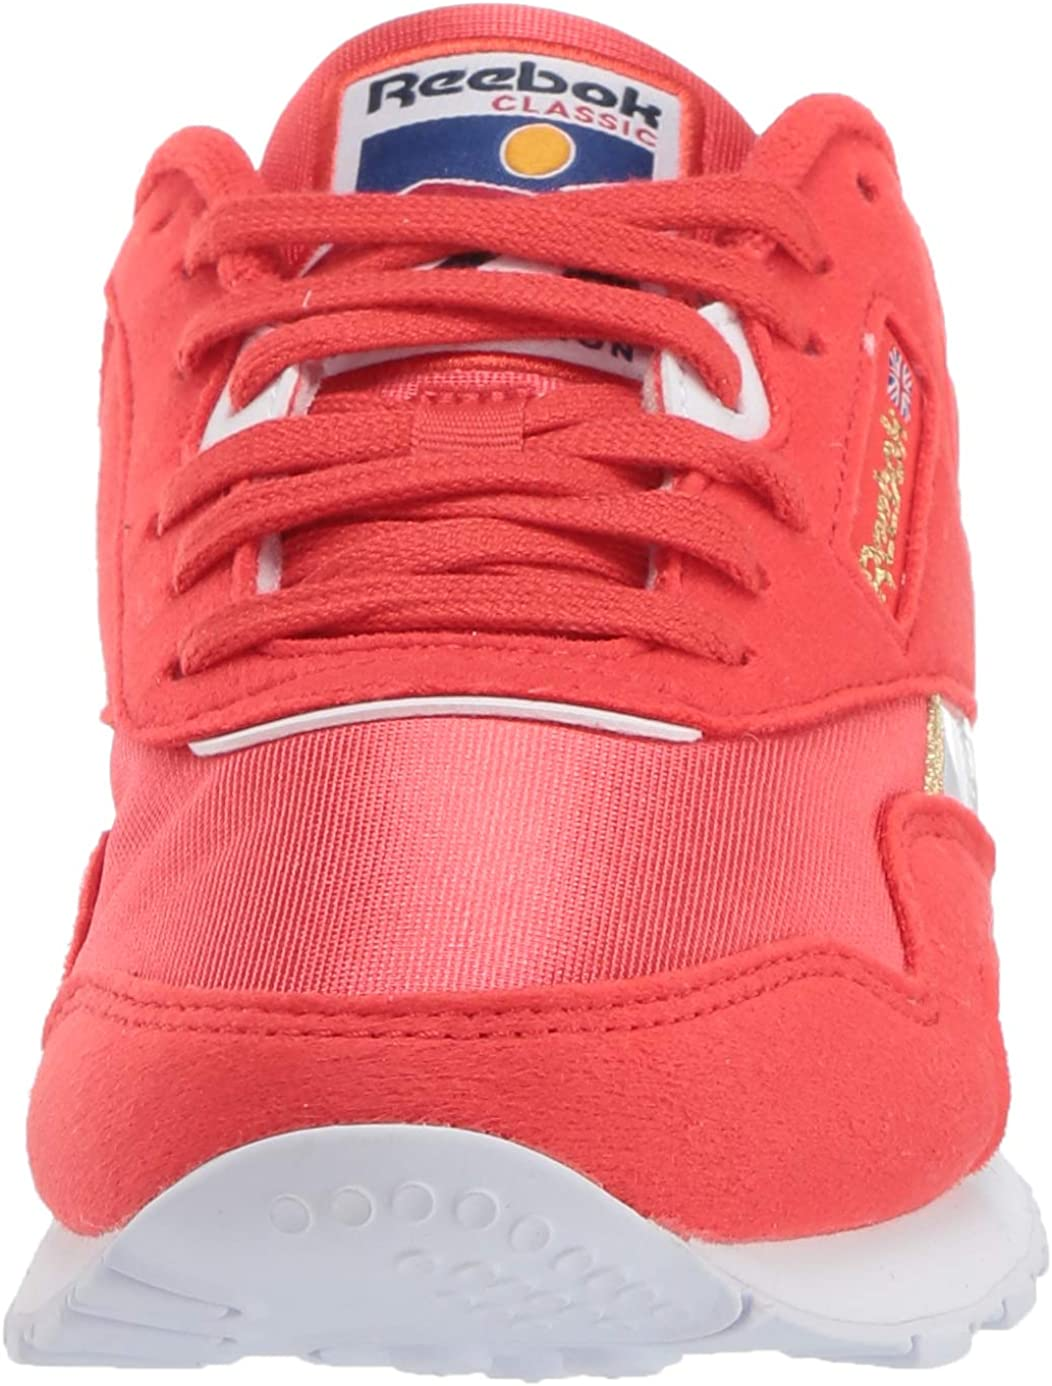 Reebok Classic Nylon Chaussures de sport pour homme Rouge Blanc Rouge Rayonnant